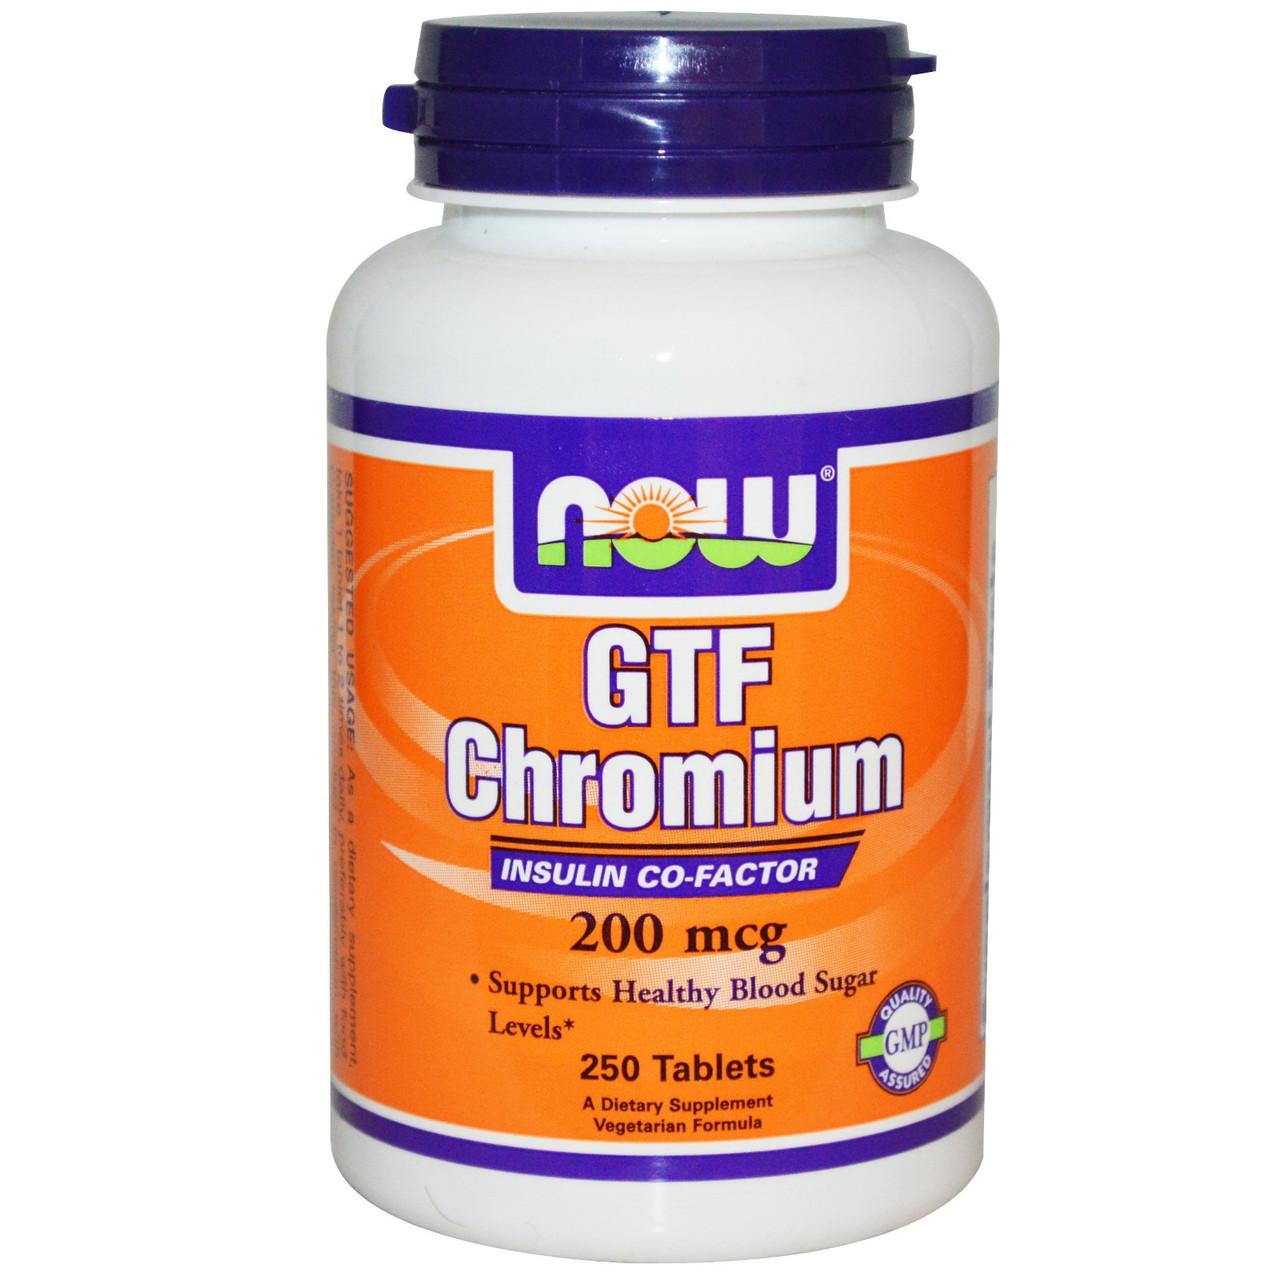 Хром GTF , Now Foods, 200 мкг, 250 таблеток